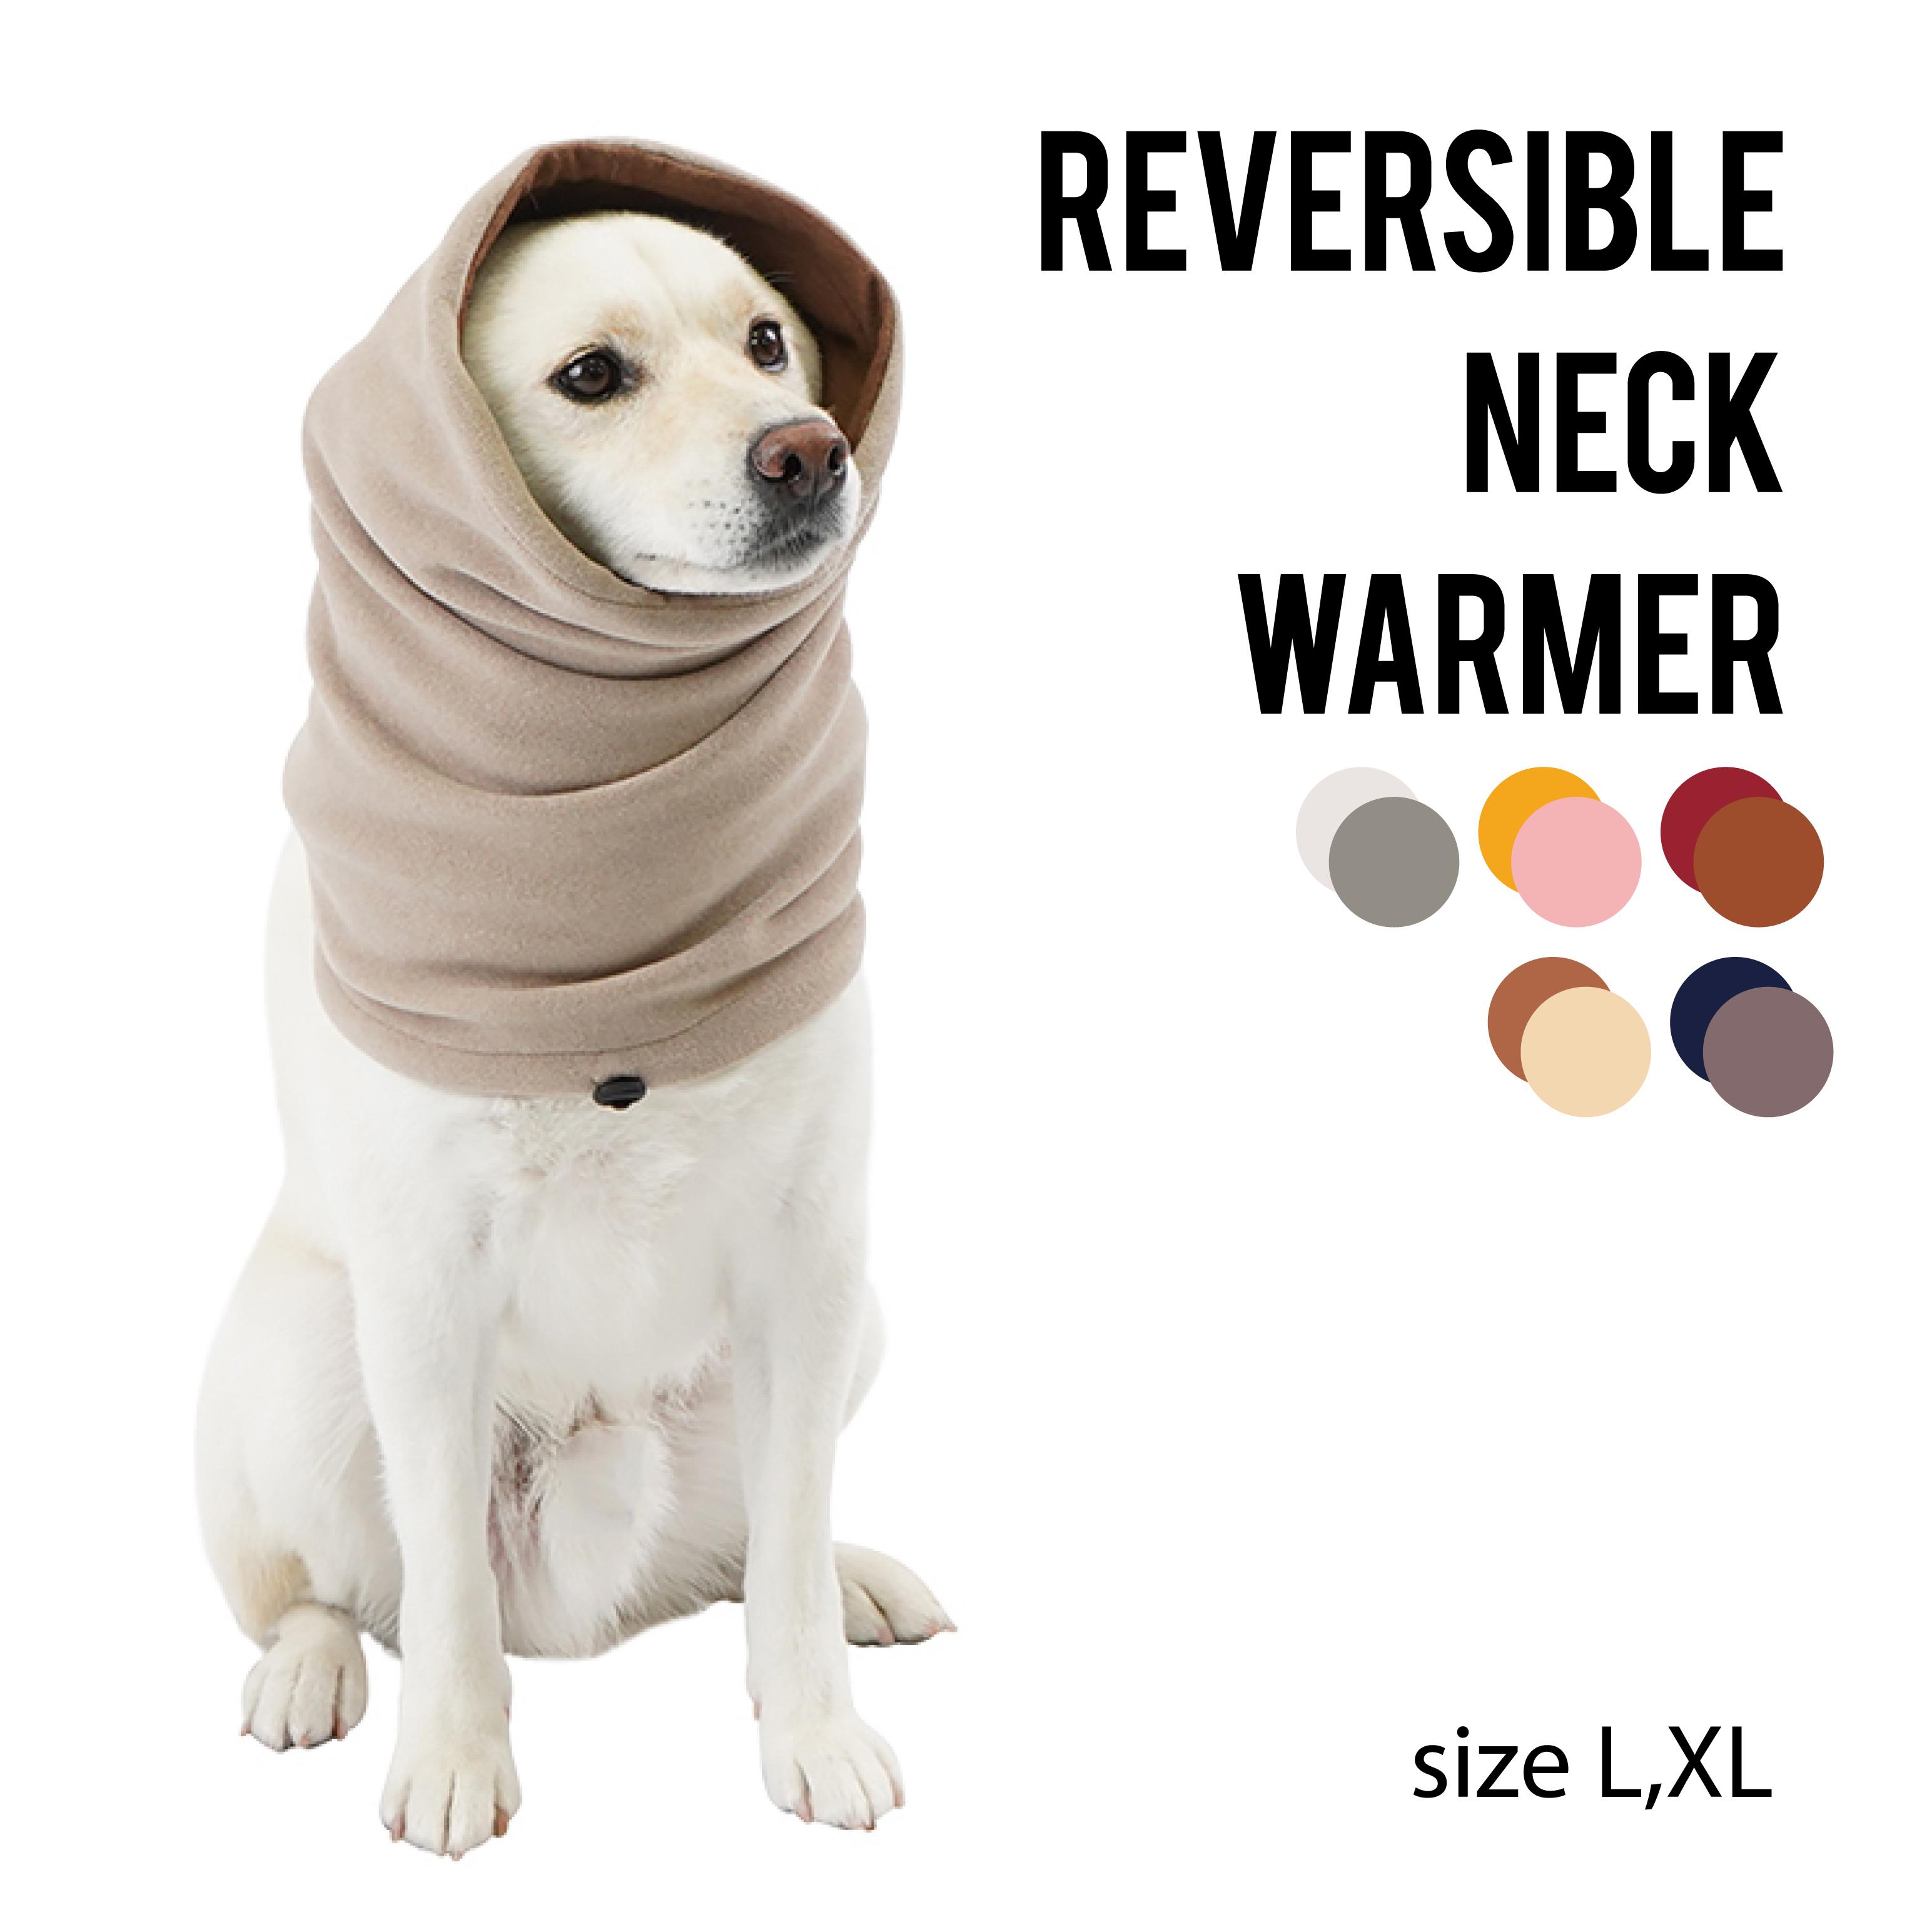 Reversible Neck Warmer(L,XL)リバーシブルネックウォーマー